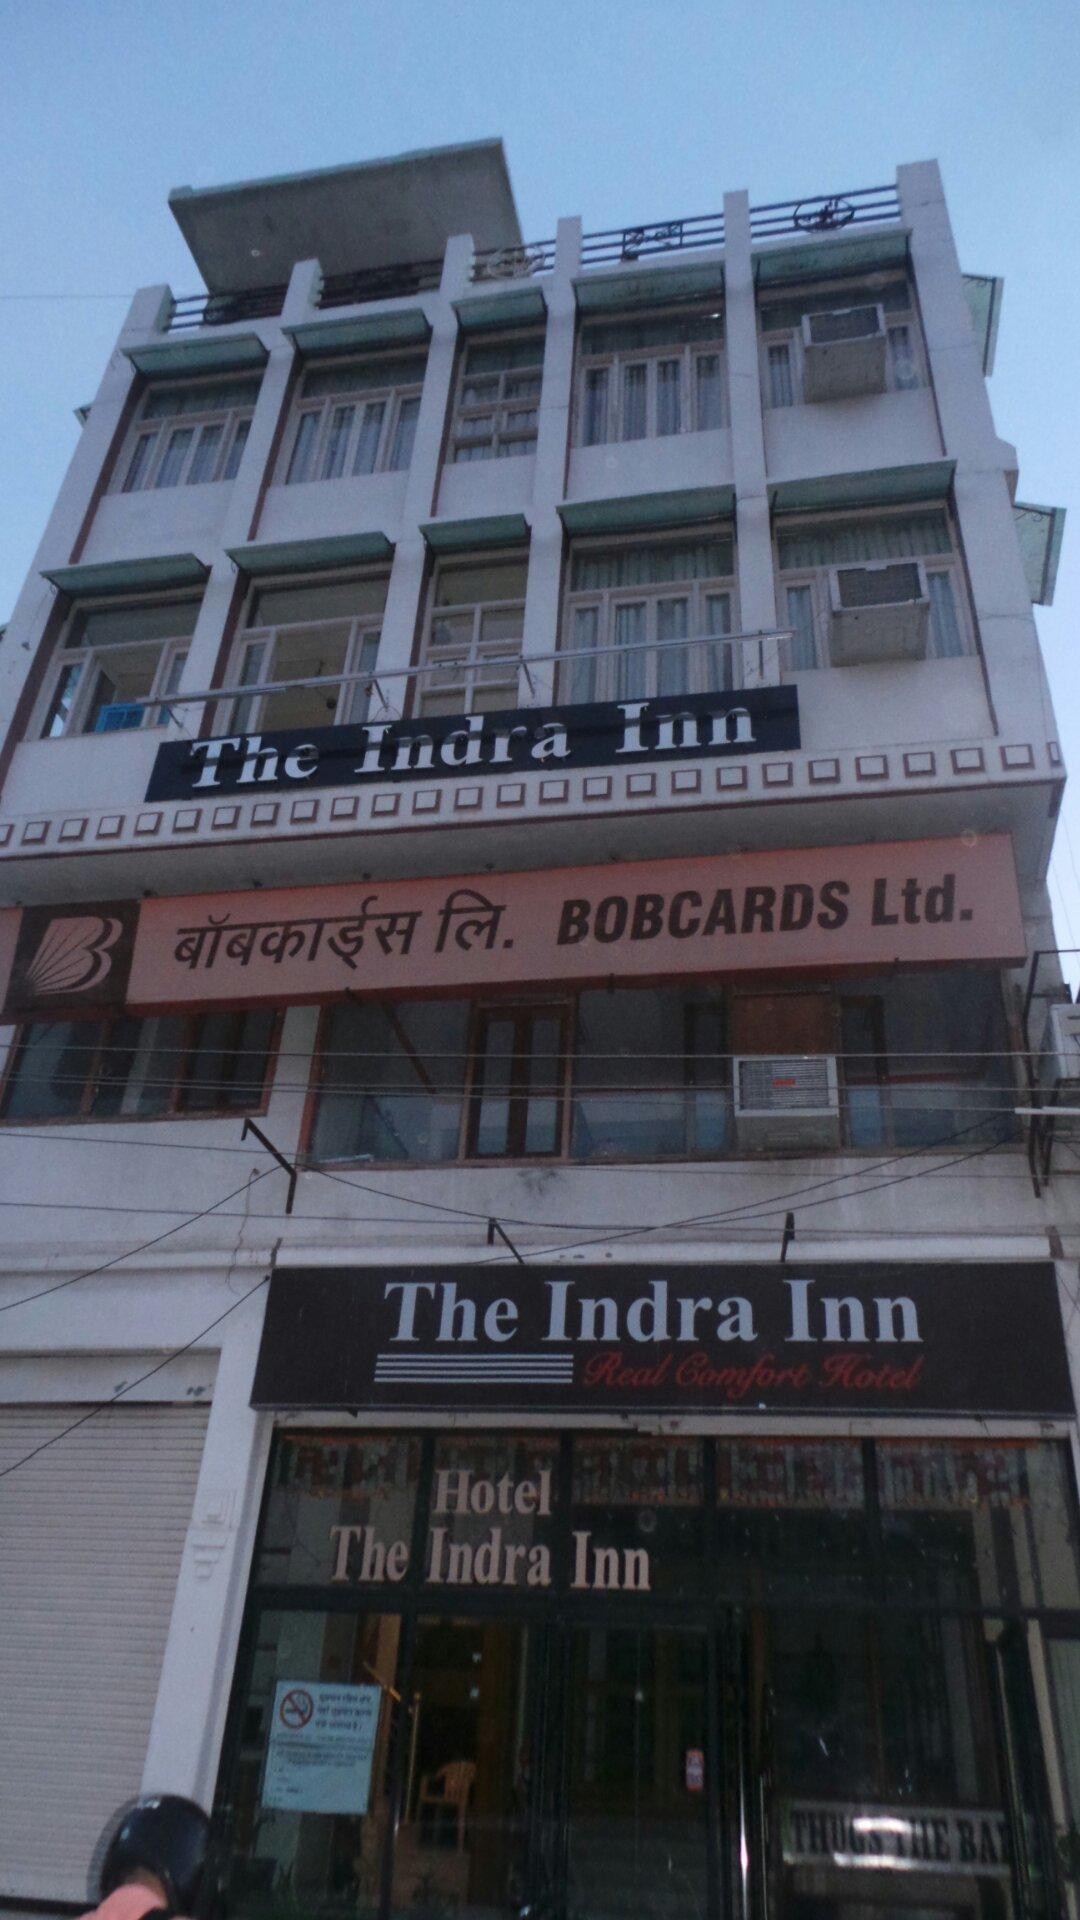 The Indra Inn in Jodhpur